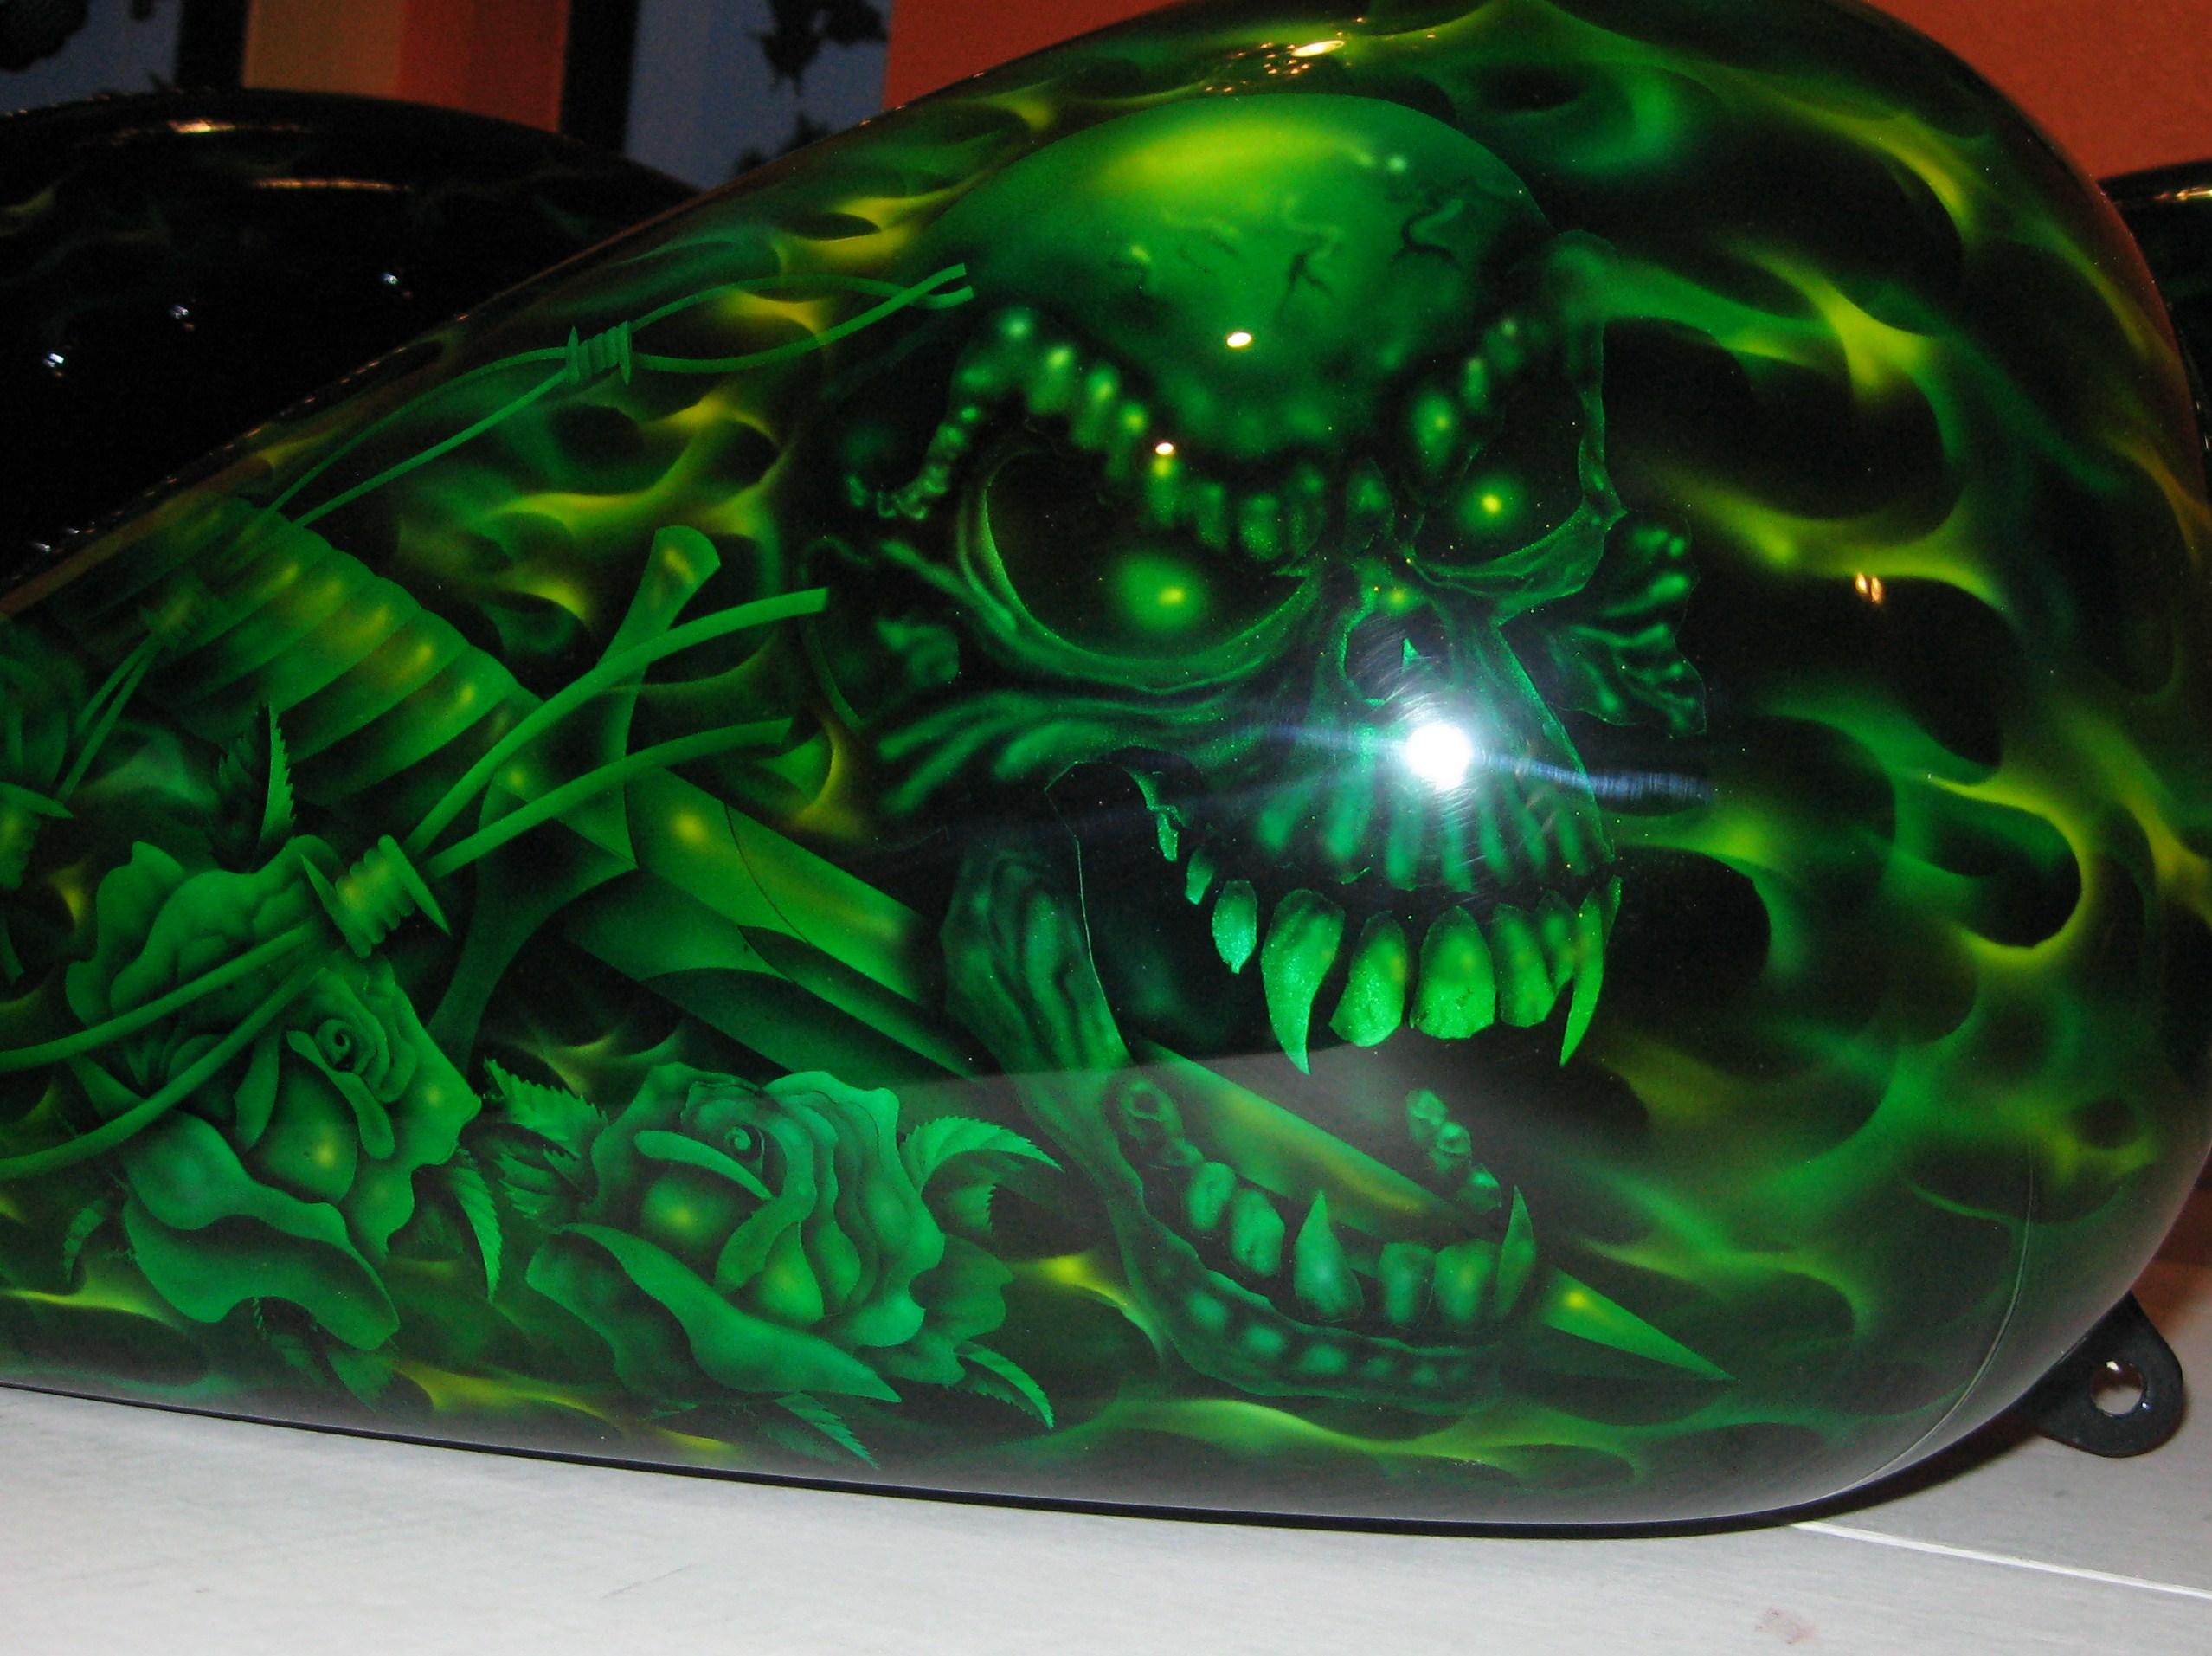 Harley-Davidson-Green-Toxic-Flames-Tribal-Skull-Gastank-Gas-Tank